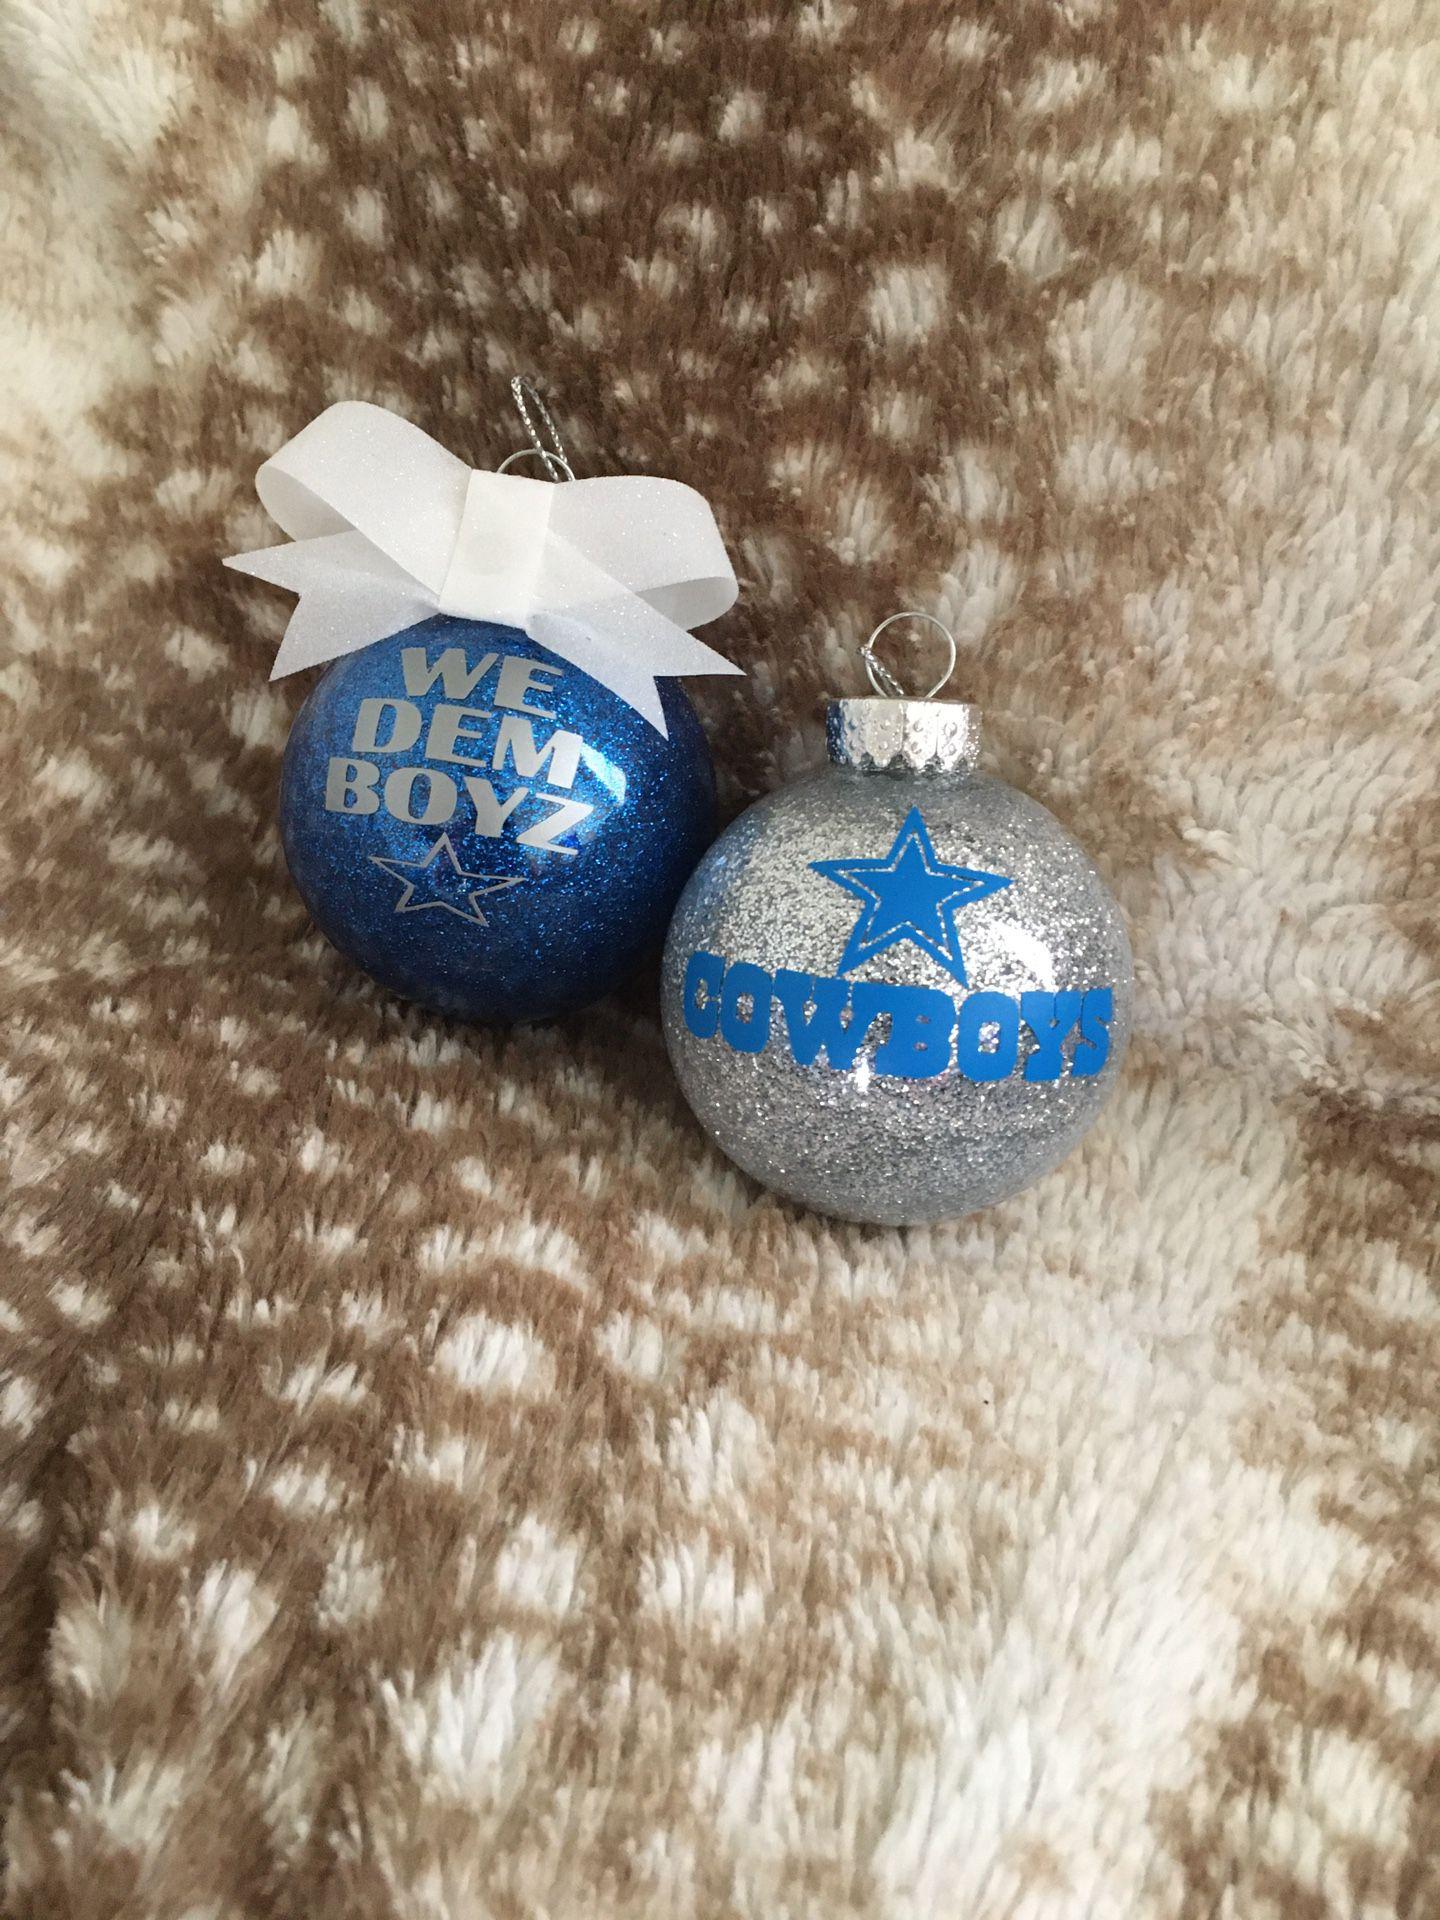 Cowboys Christmas ornaments